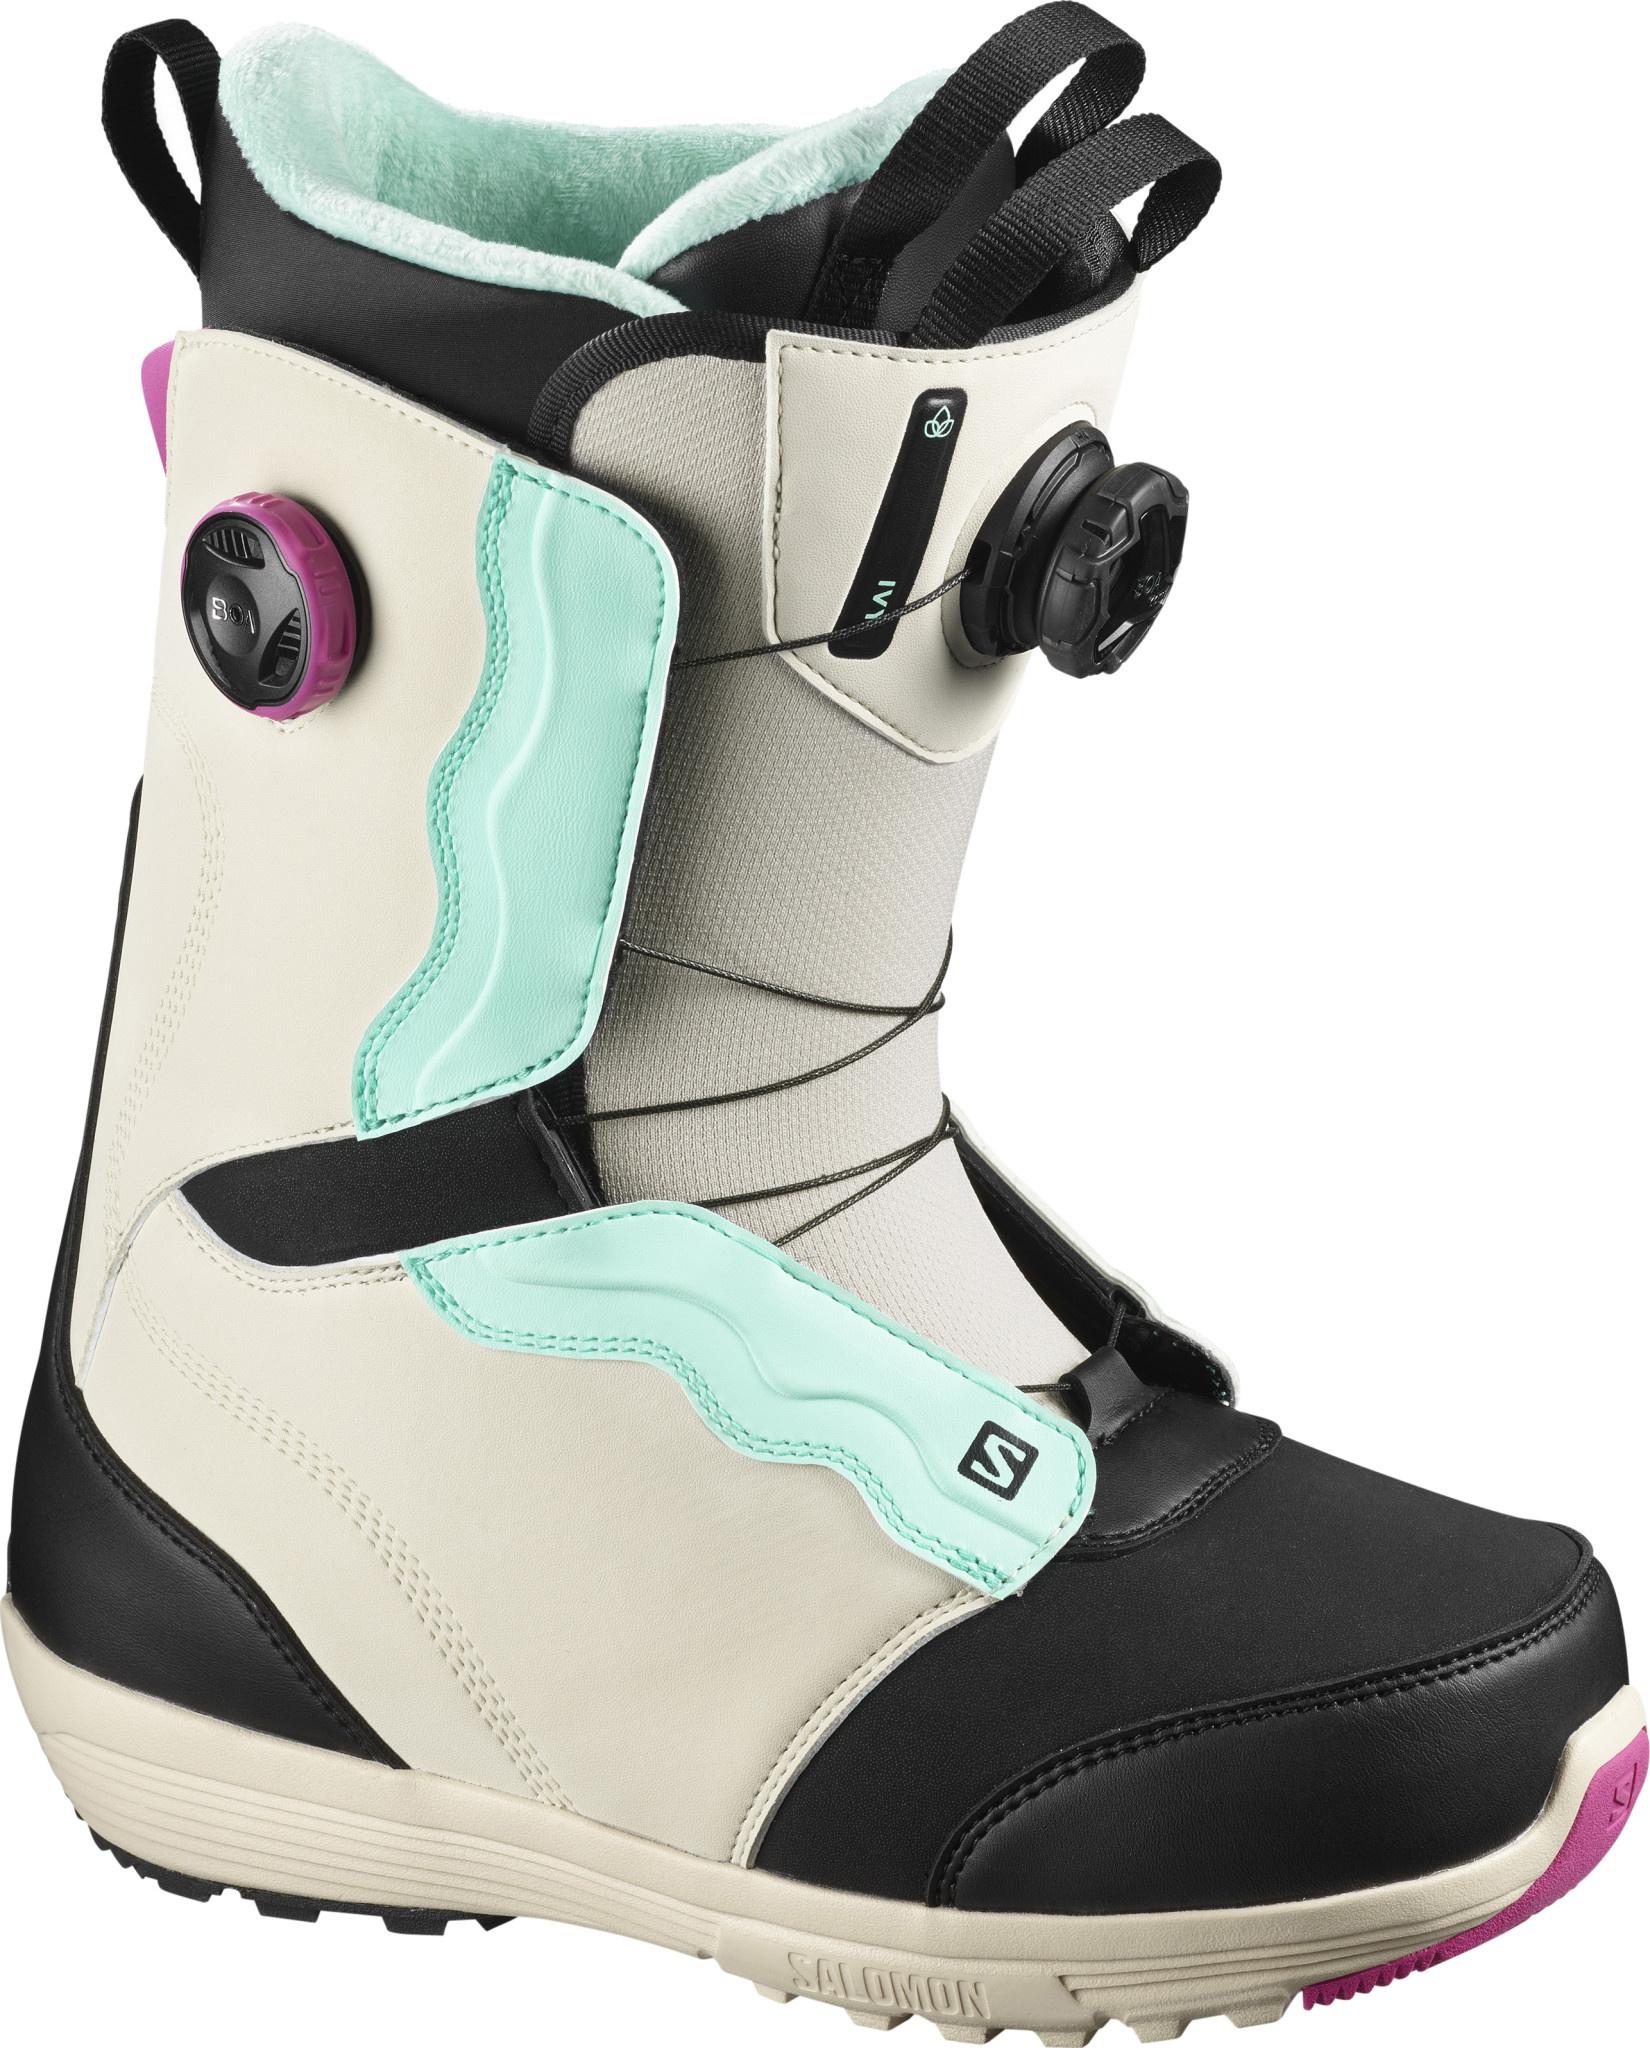 SALOMON Salomon Women's Ivy STR8JKT Boa Snowboard Boot (2021)